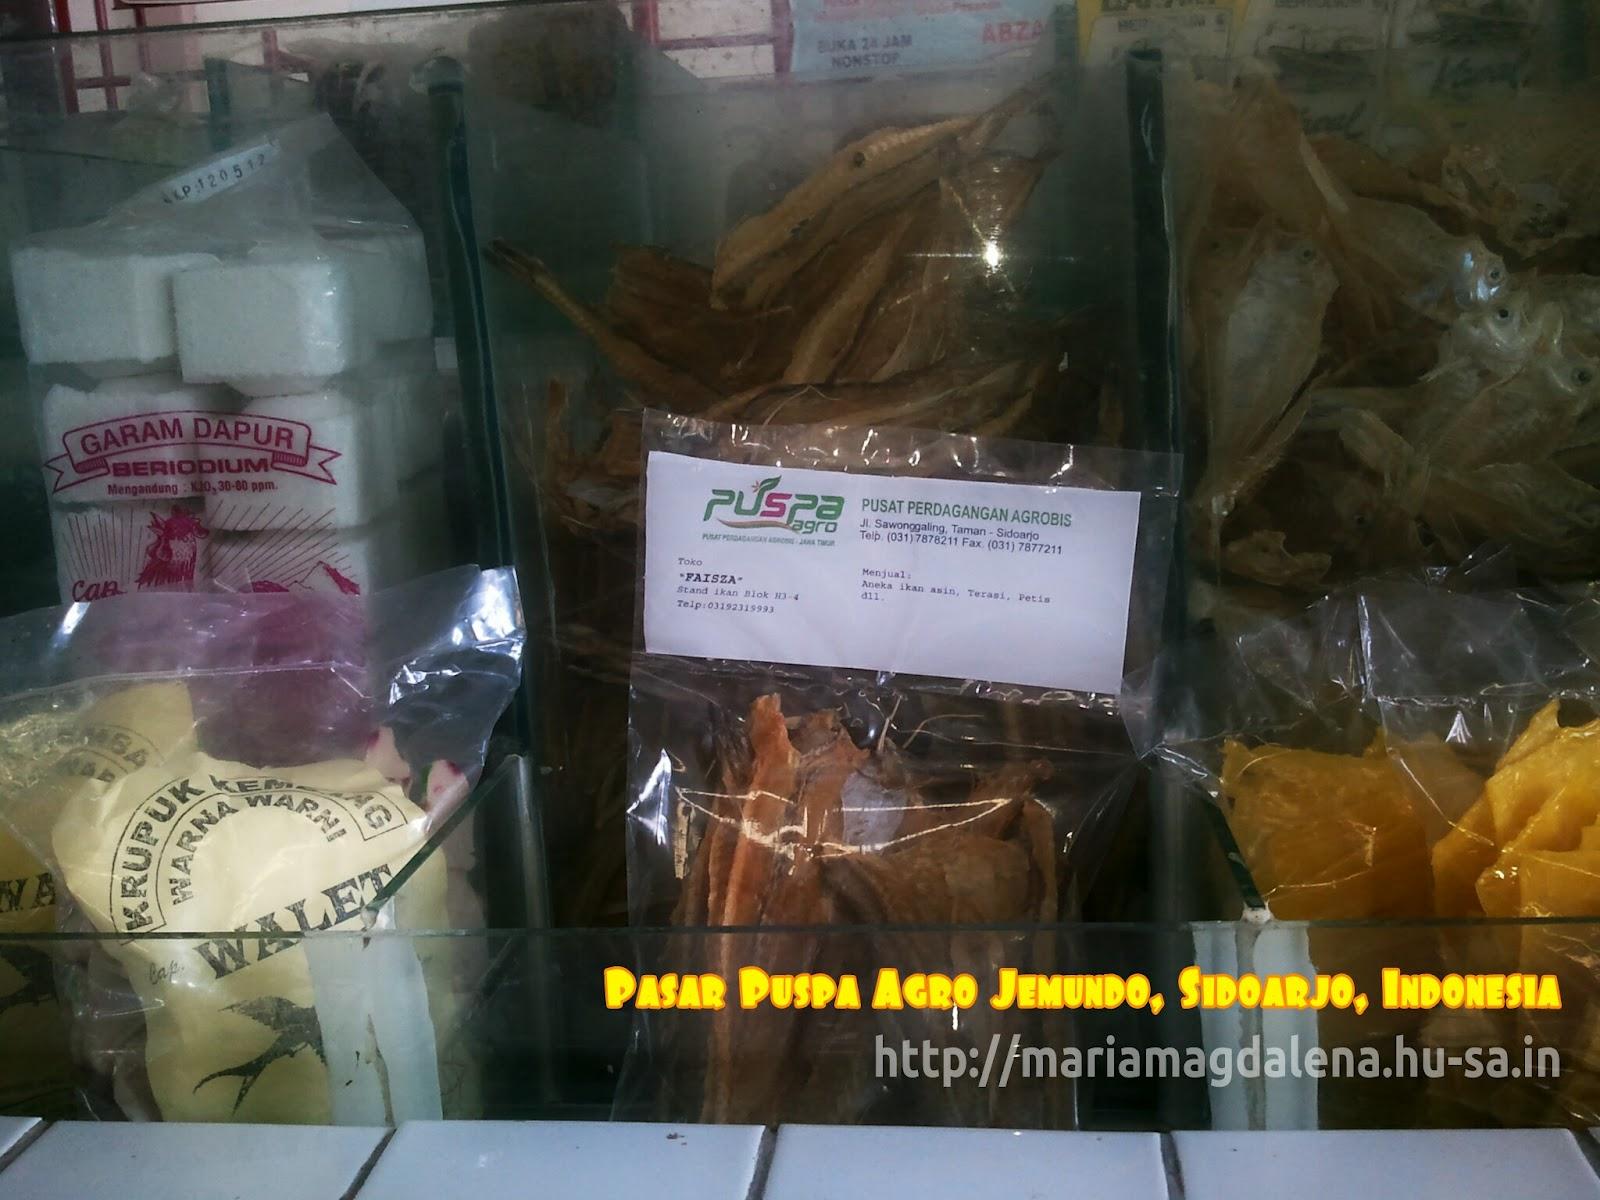 Pasar Puspa Agro Jemundo Maria Magdalena Living Ideas Foto Tampak